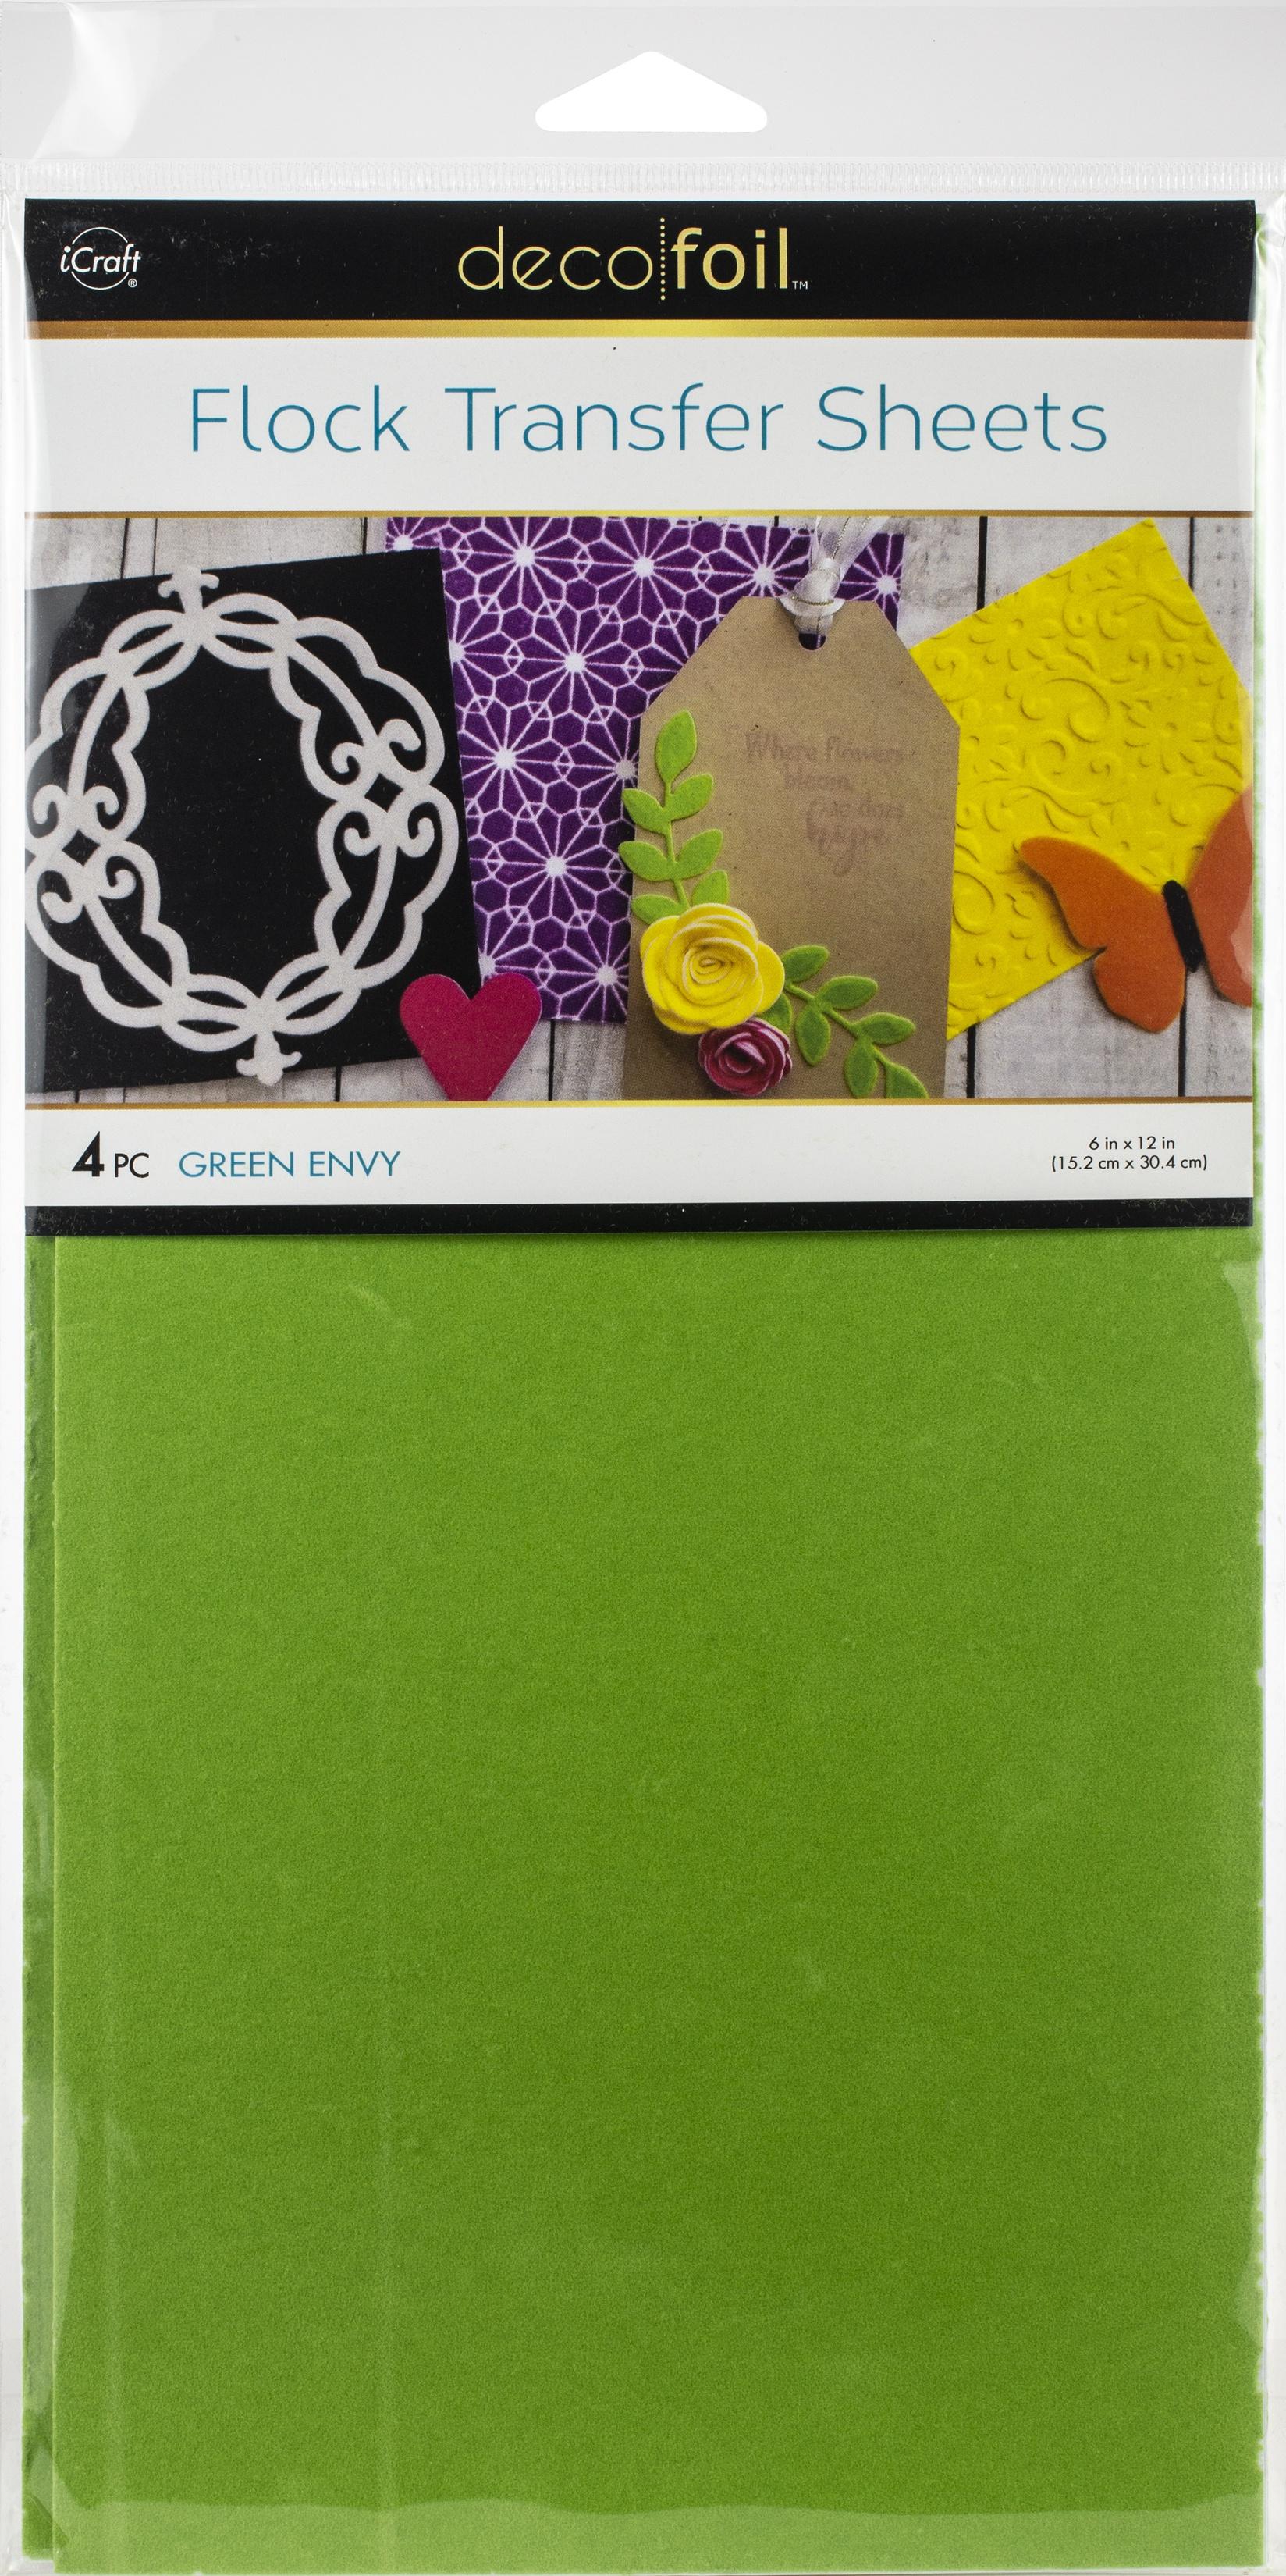 Deco Foil Flock Transfer Sheets 6X12 4/Pkg-Green Envy